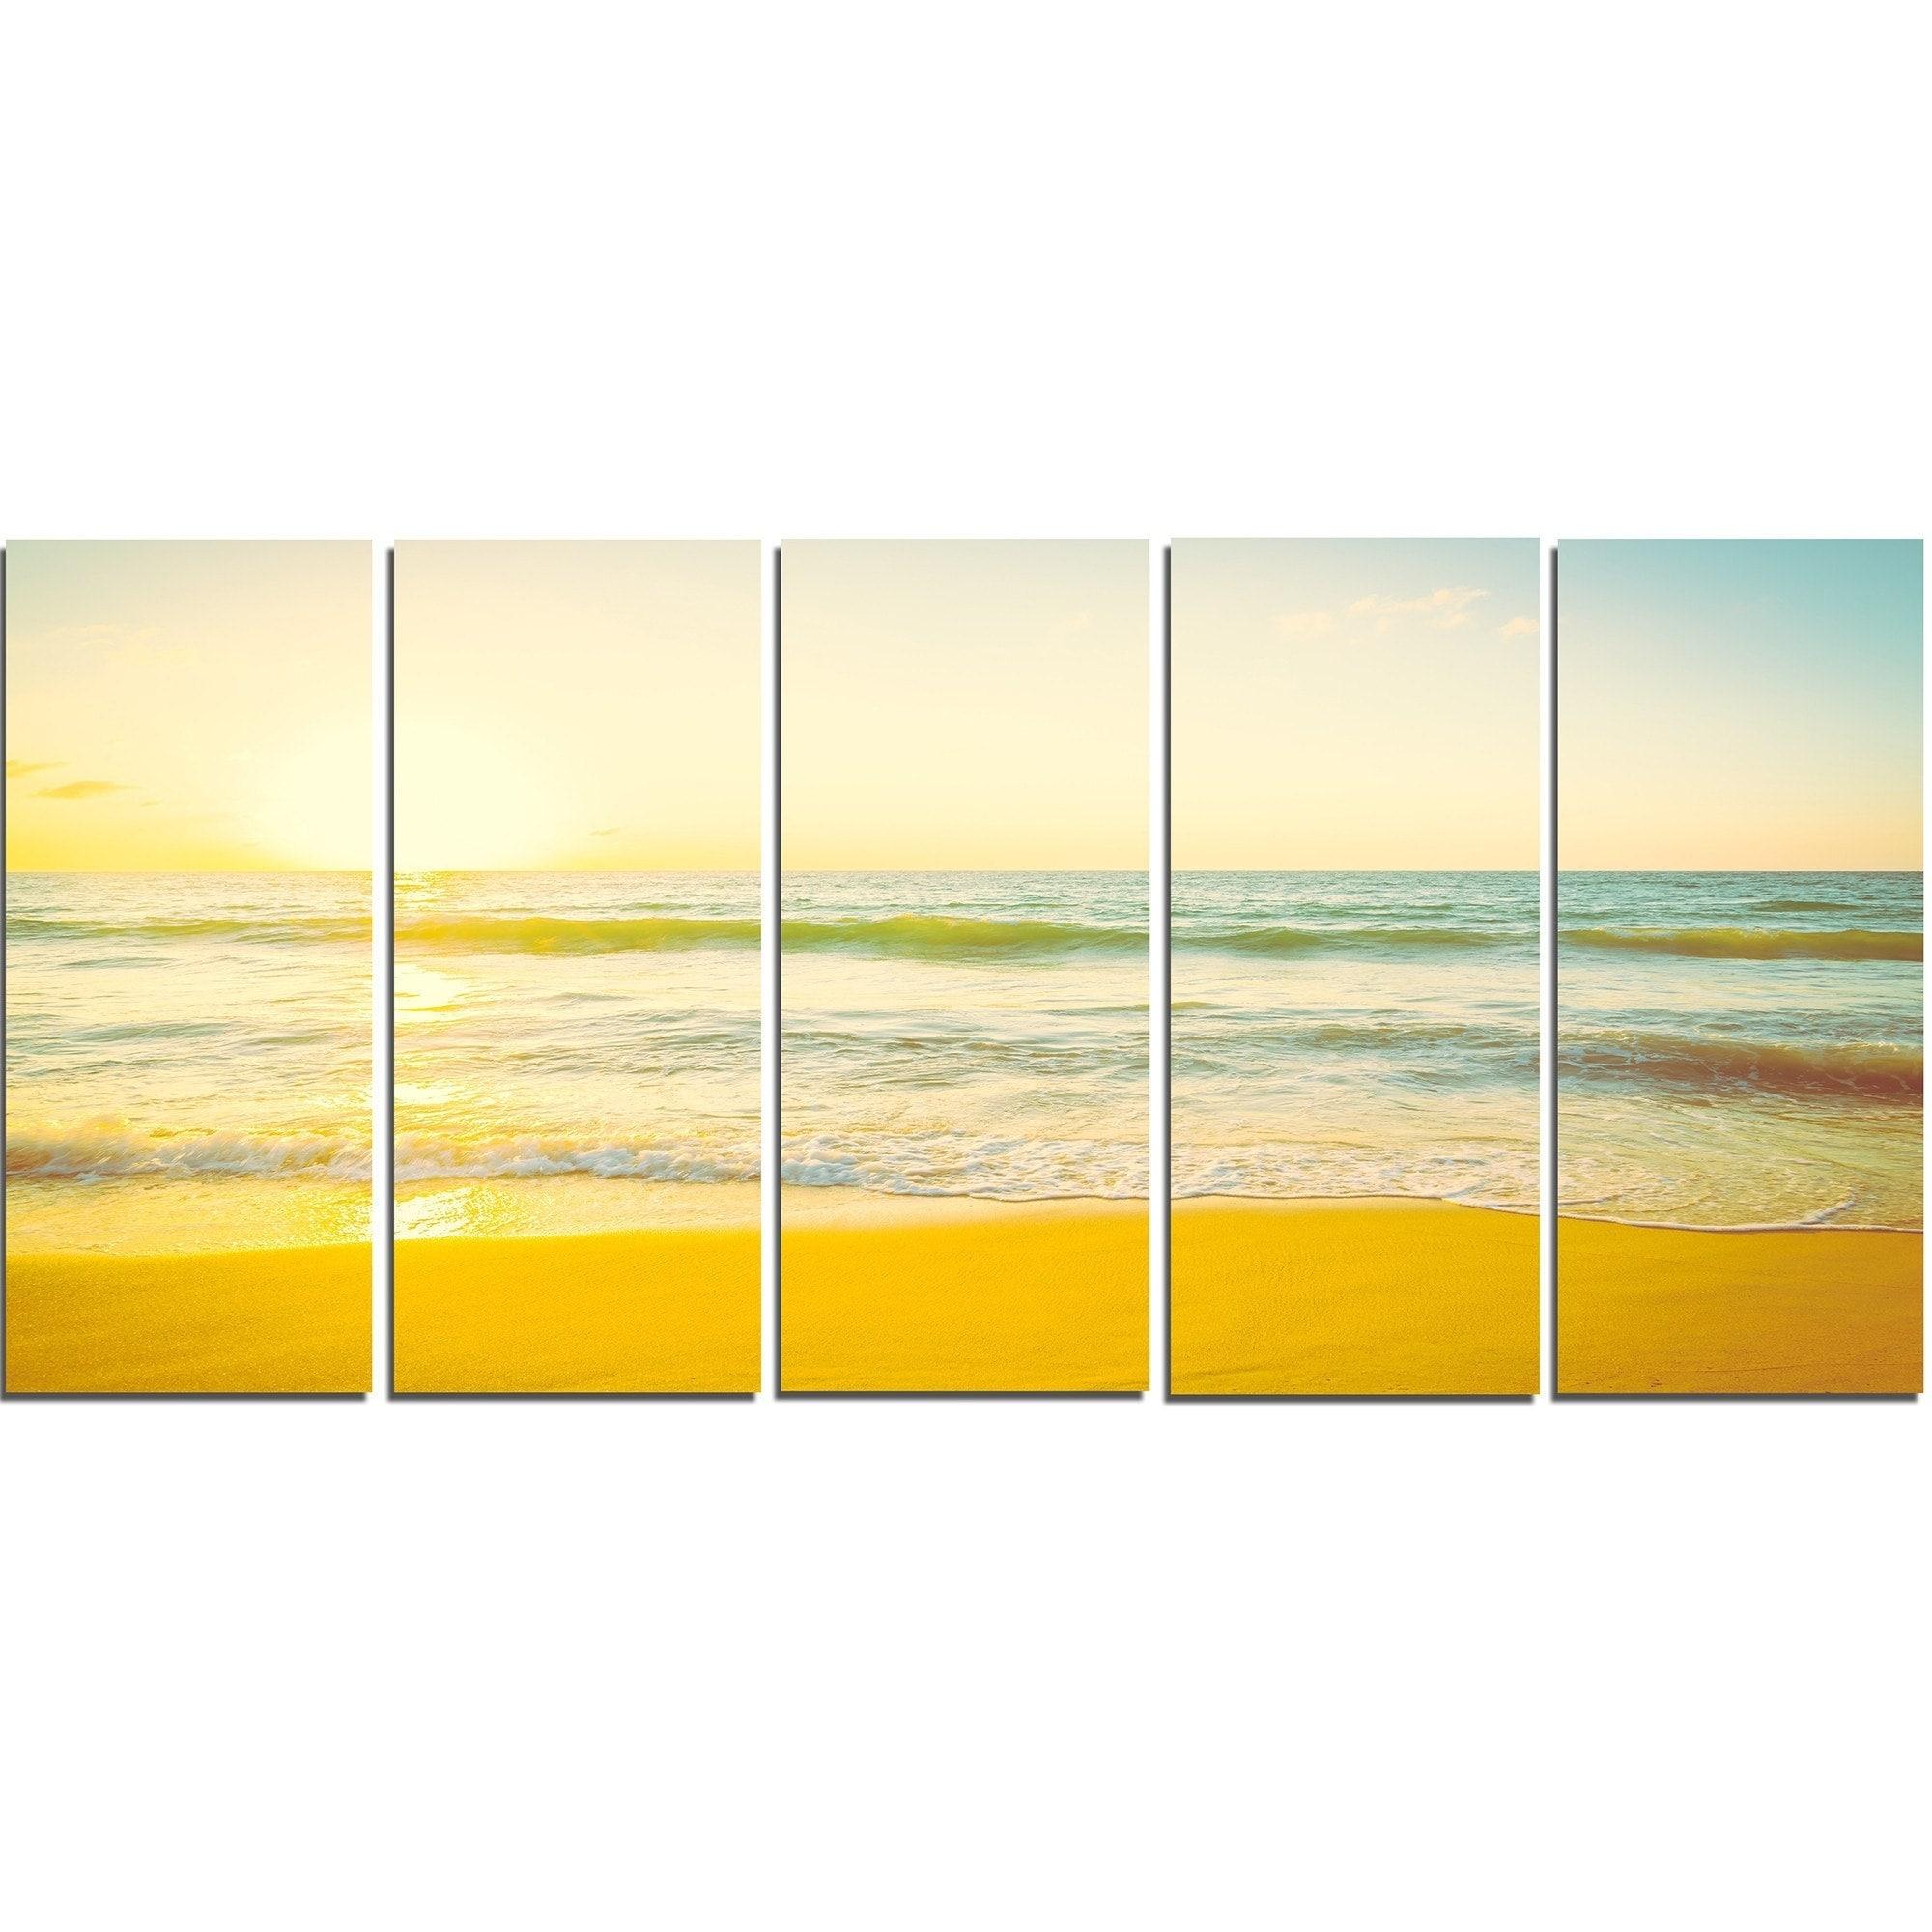 Cool Seascape Wall Art Ideas - The Wall Art Decorations ...